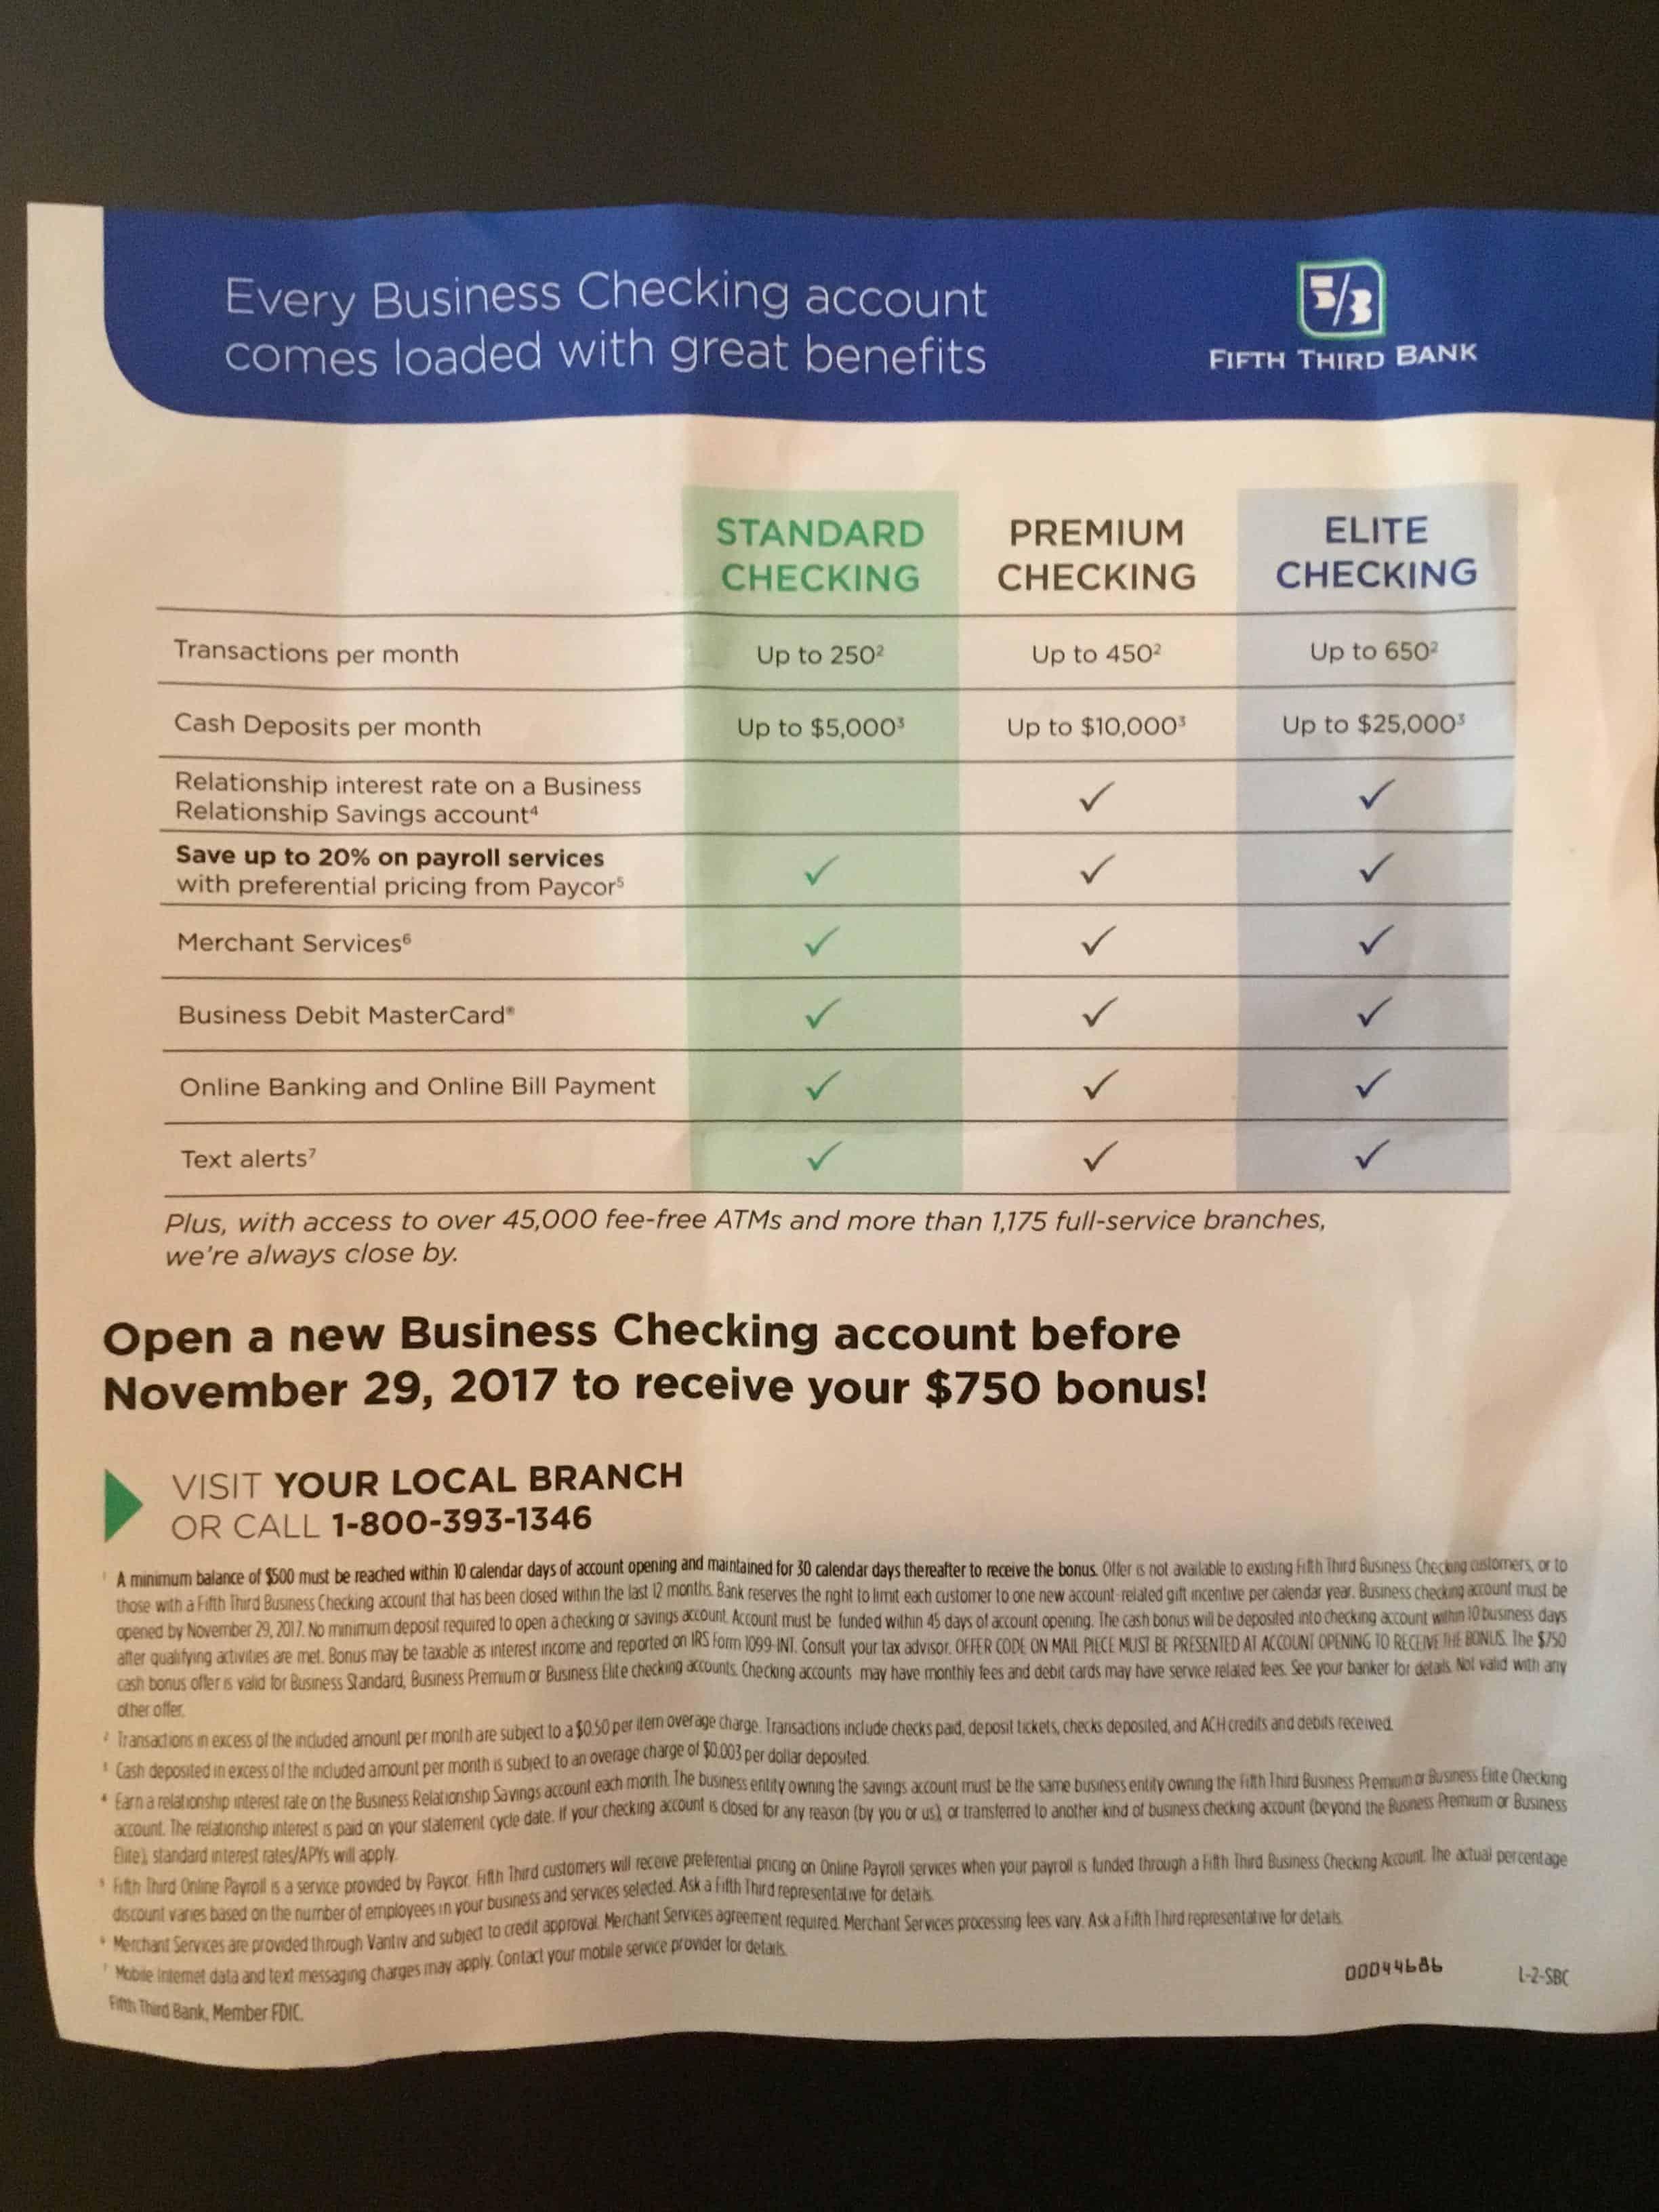 fifth third bank business checking account review $750 bonus